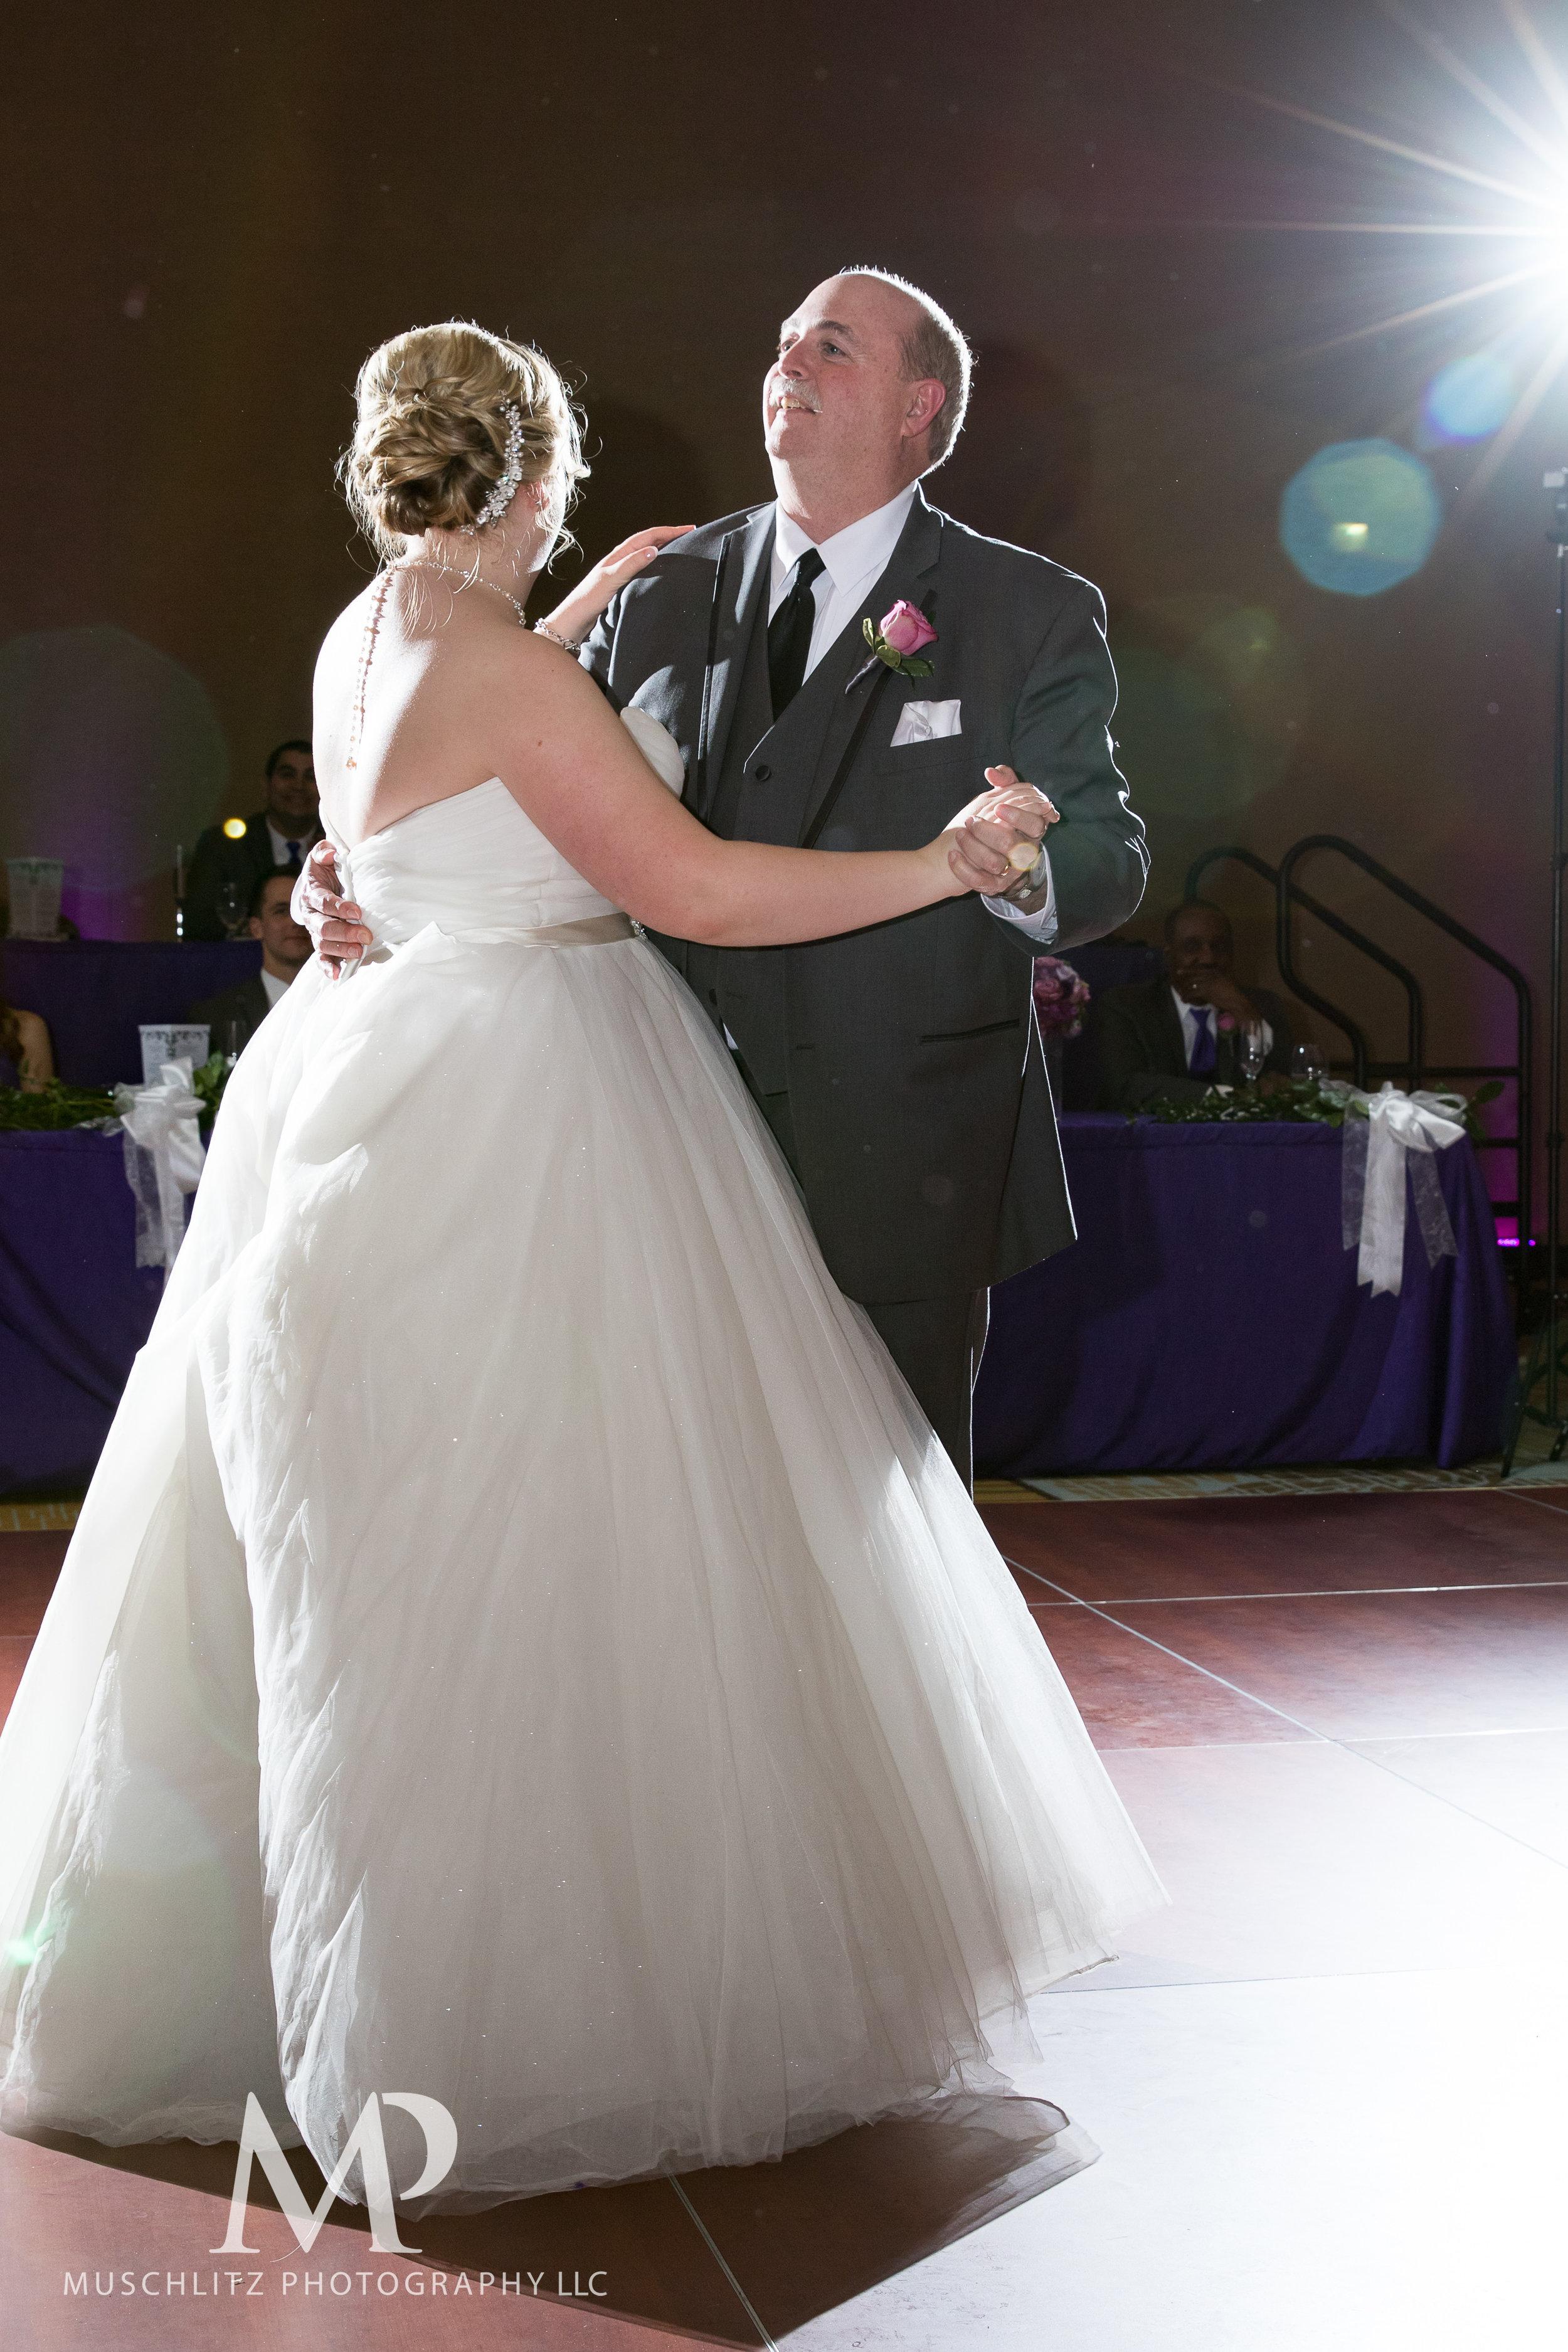 hilton-polaris-wedding-columbus-ohio-muschlitz-photography-041.JPG